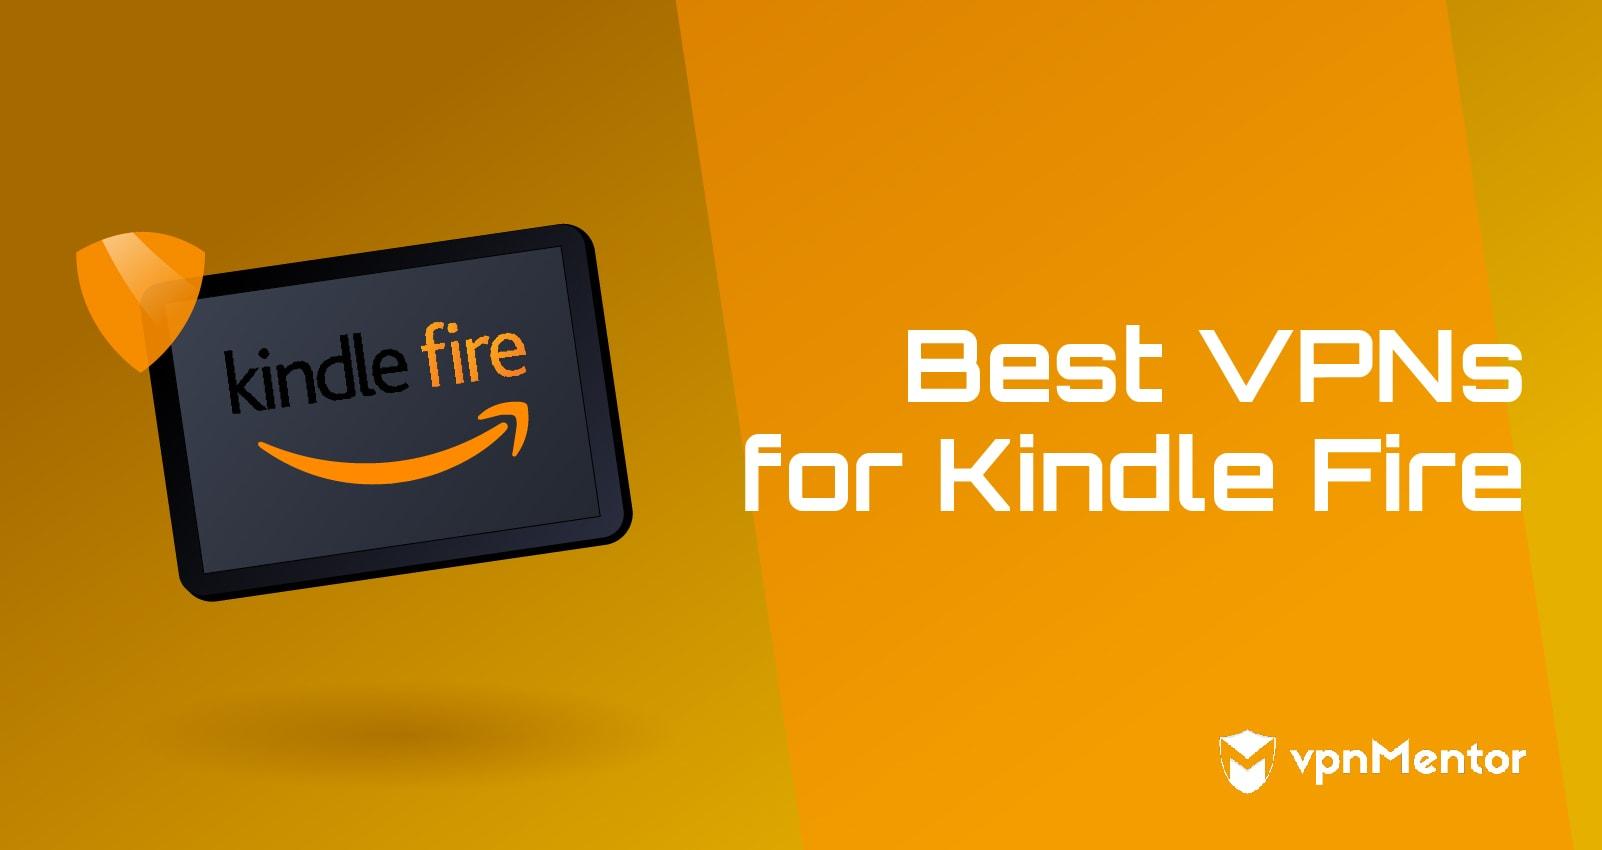 Best VPNs for Kindle Fire